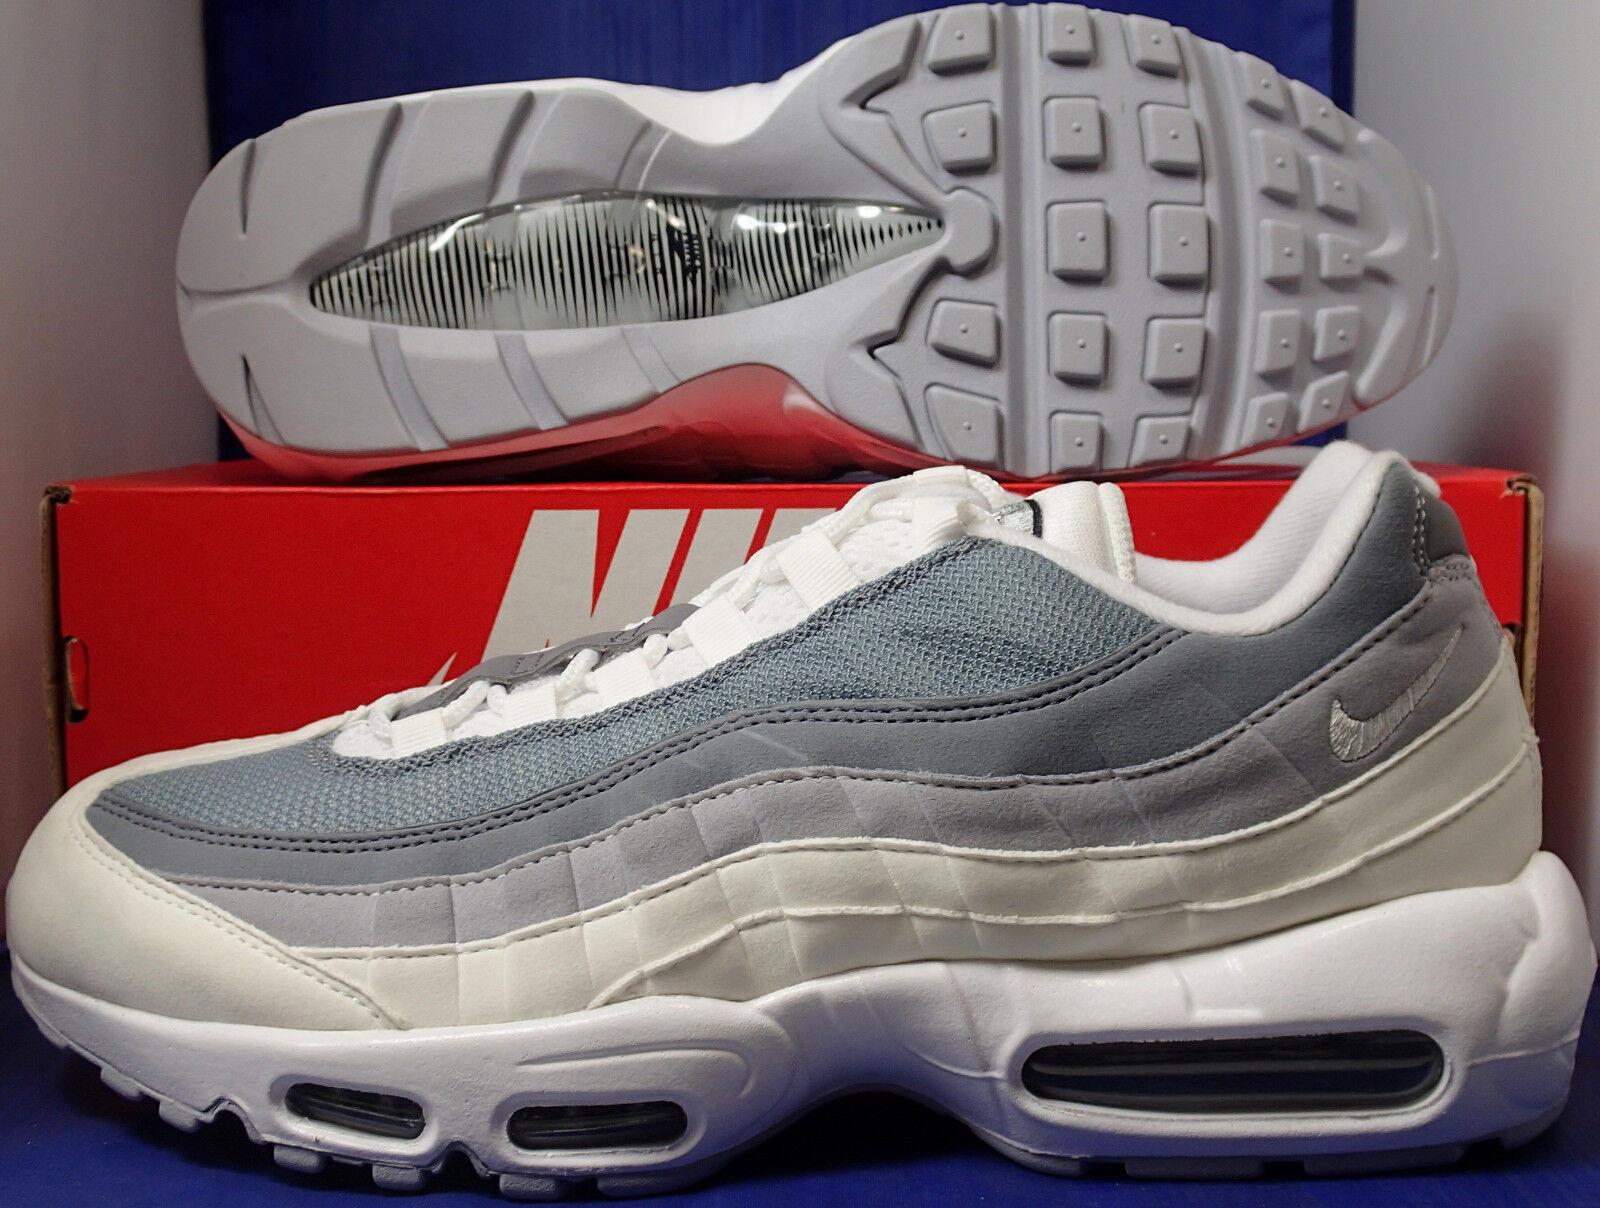 Nike Air Max 95 iD bianca 10.5 Grigio SZ 10.5 bianca ( 818592-993 ) 4099b1